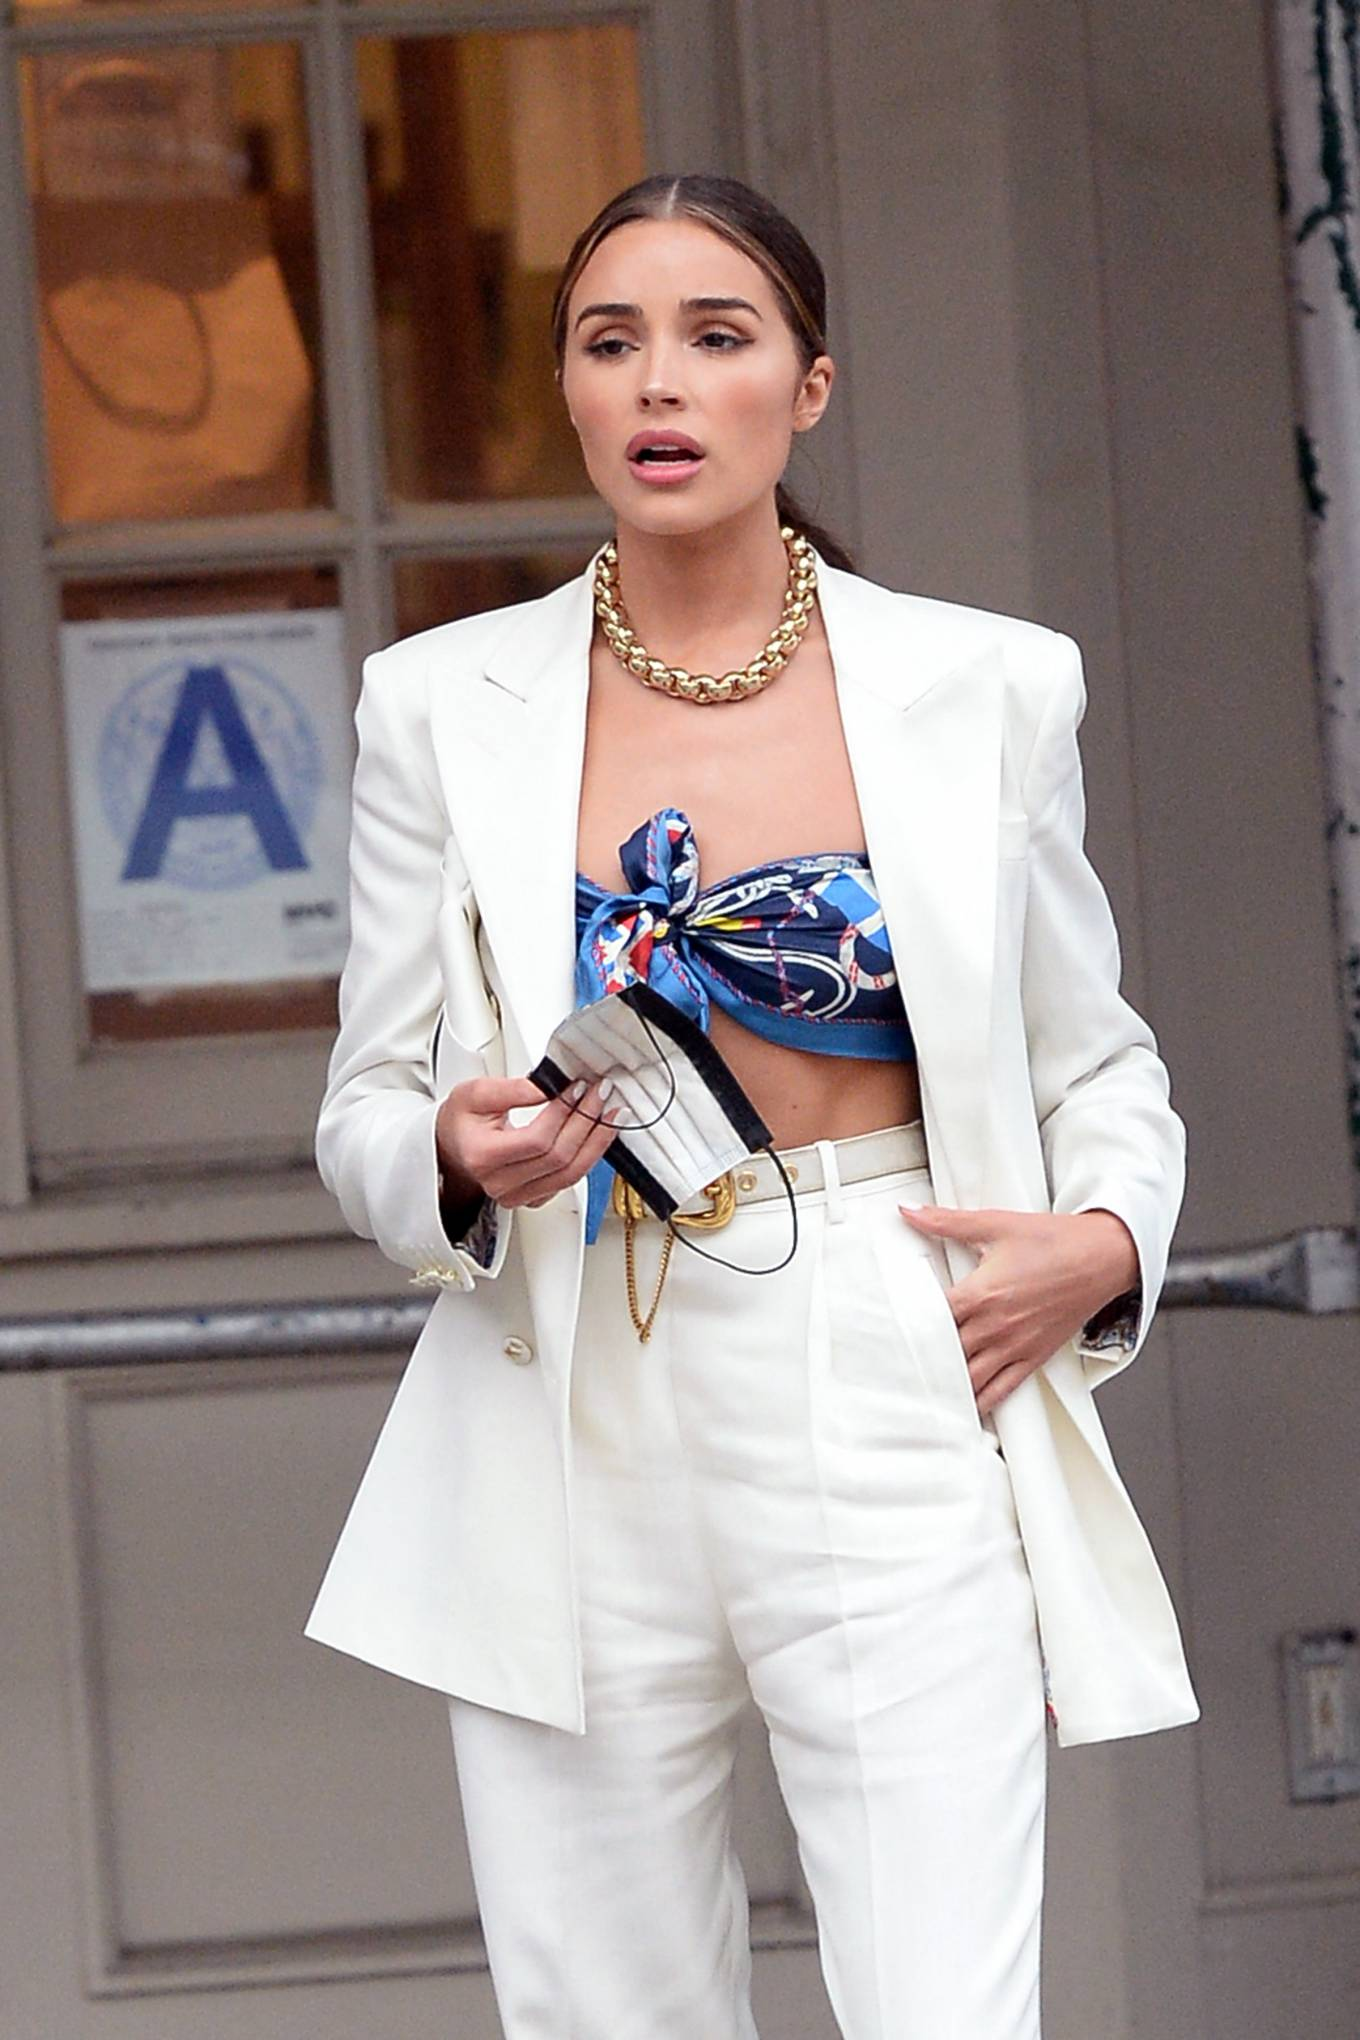 Olivia Culpo wearing square white Bottega Veneta open toe sandals with high heel